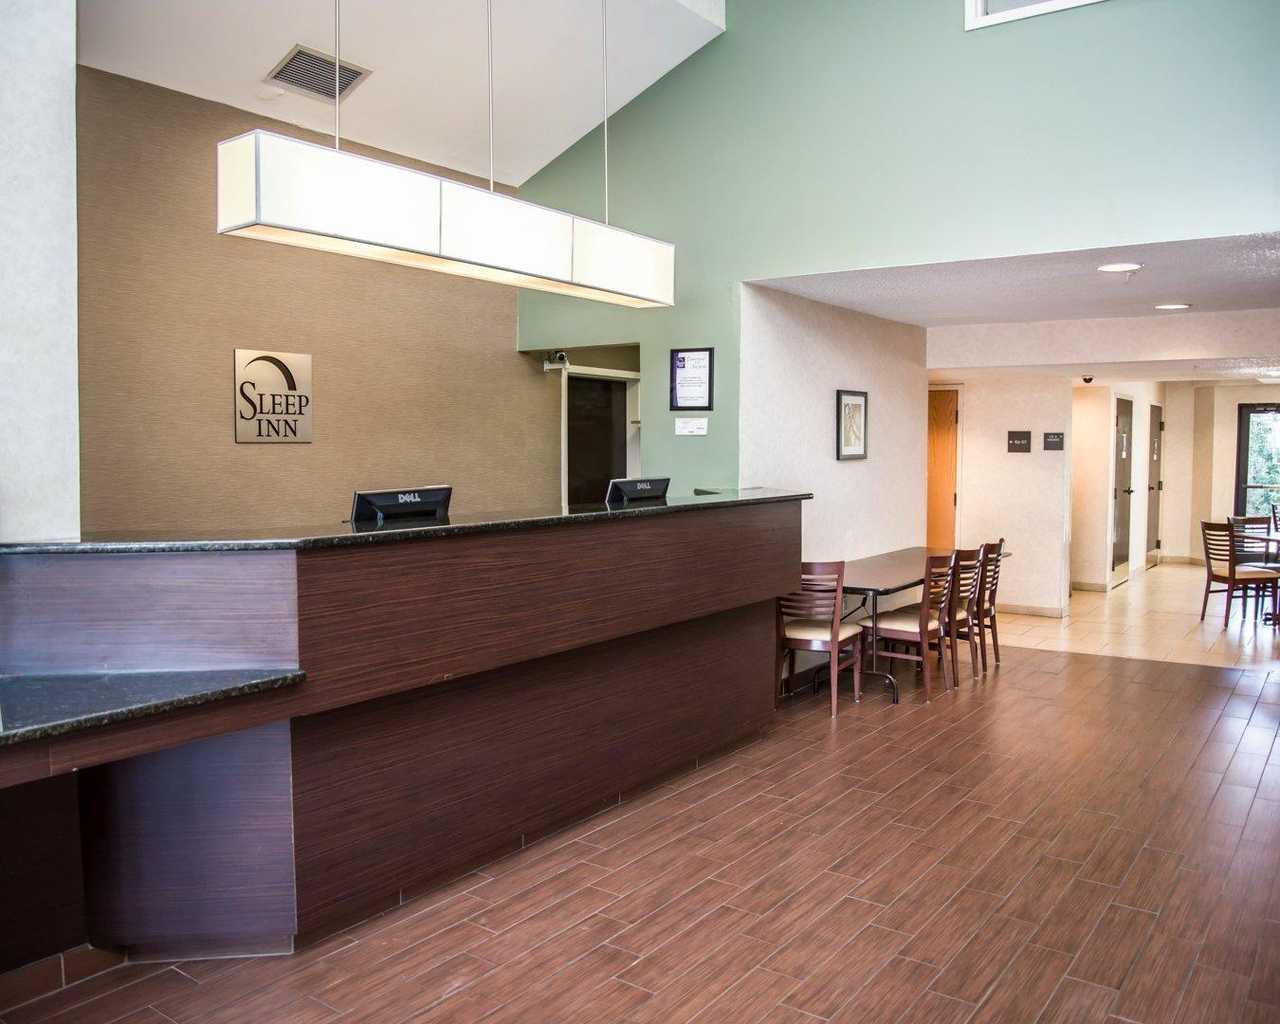 Sleep Inn University Place Charlotte - Lobby-1